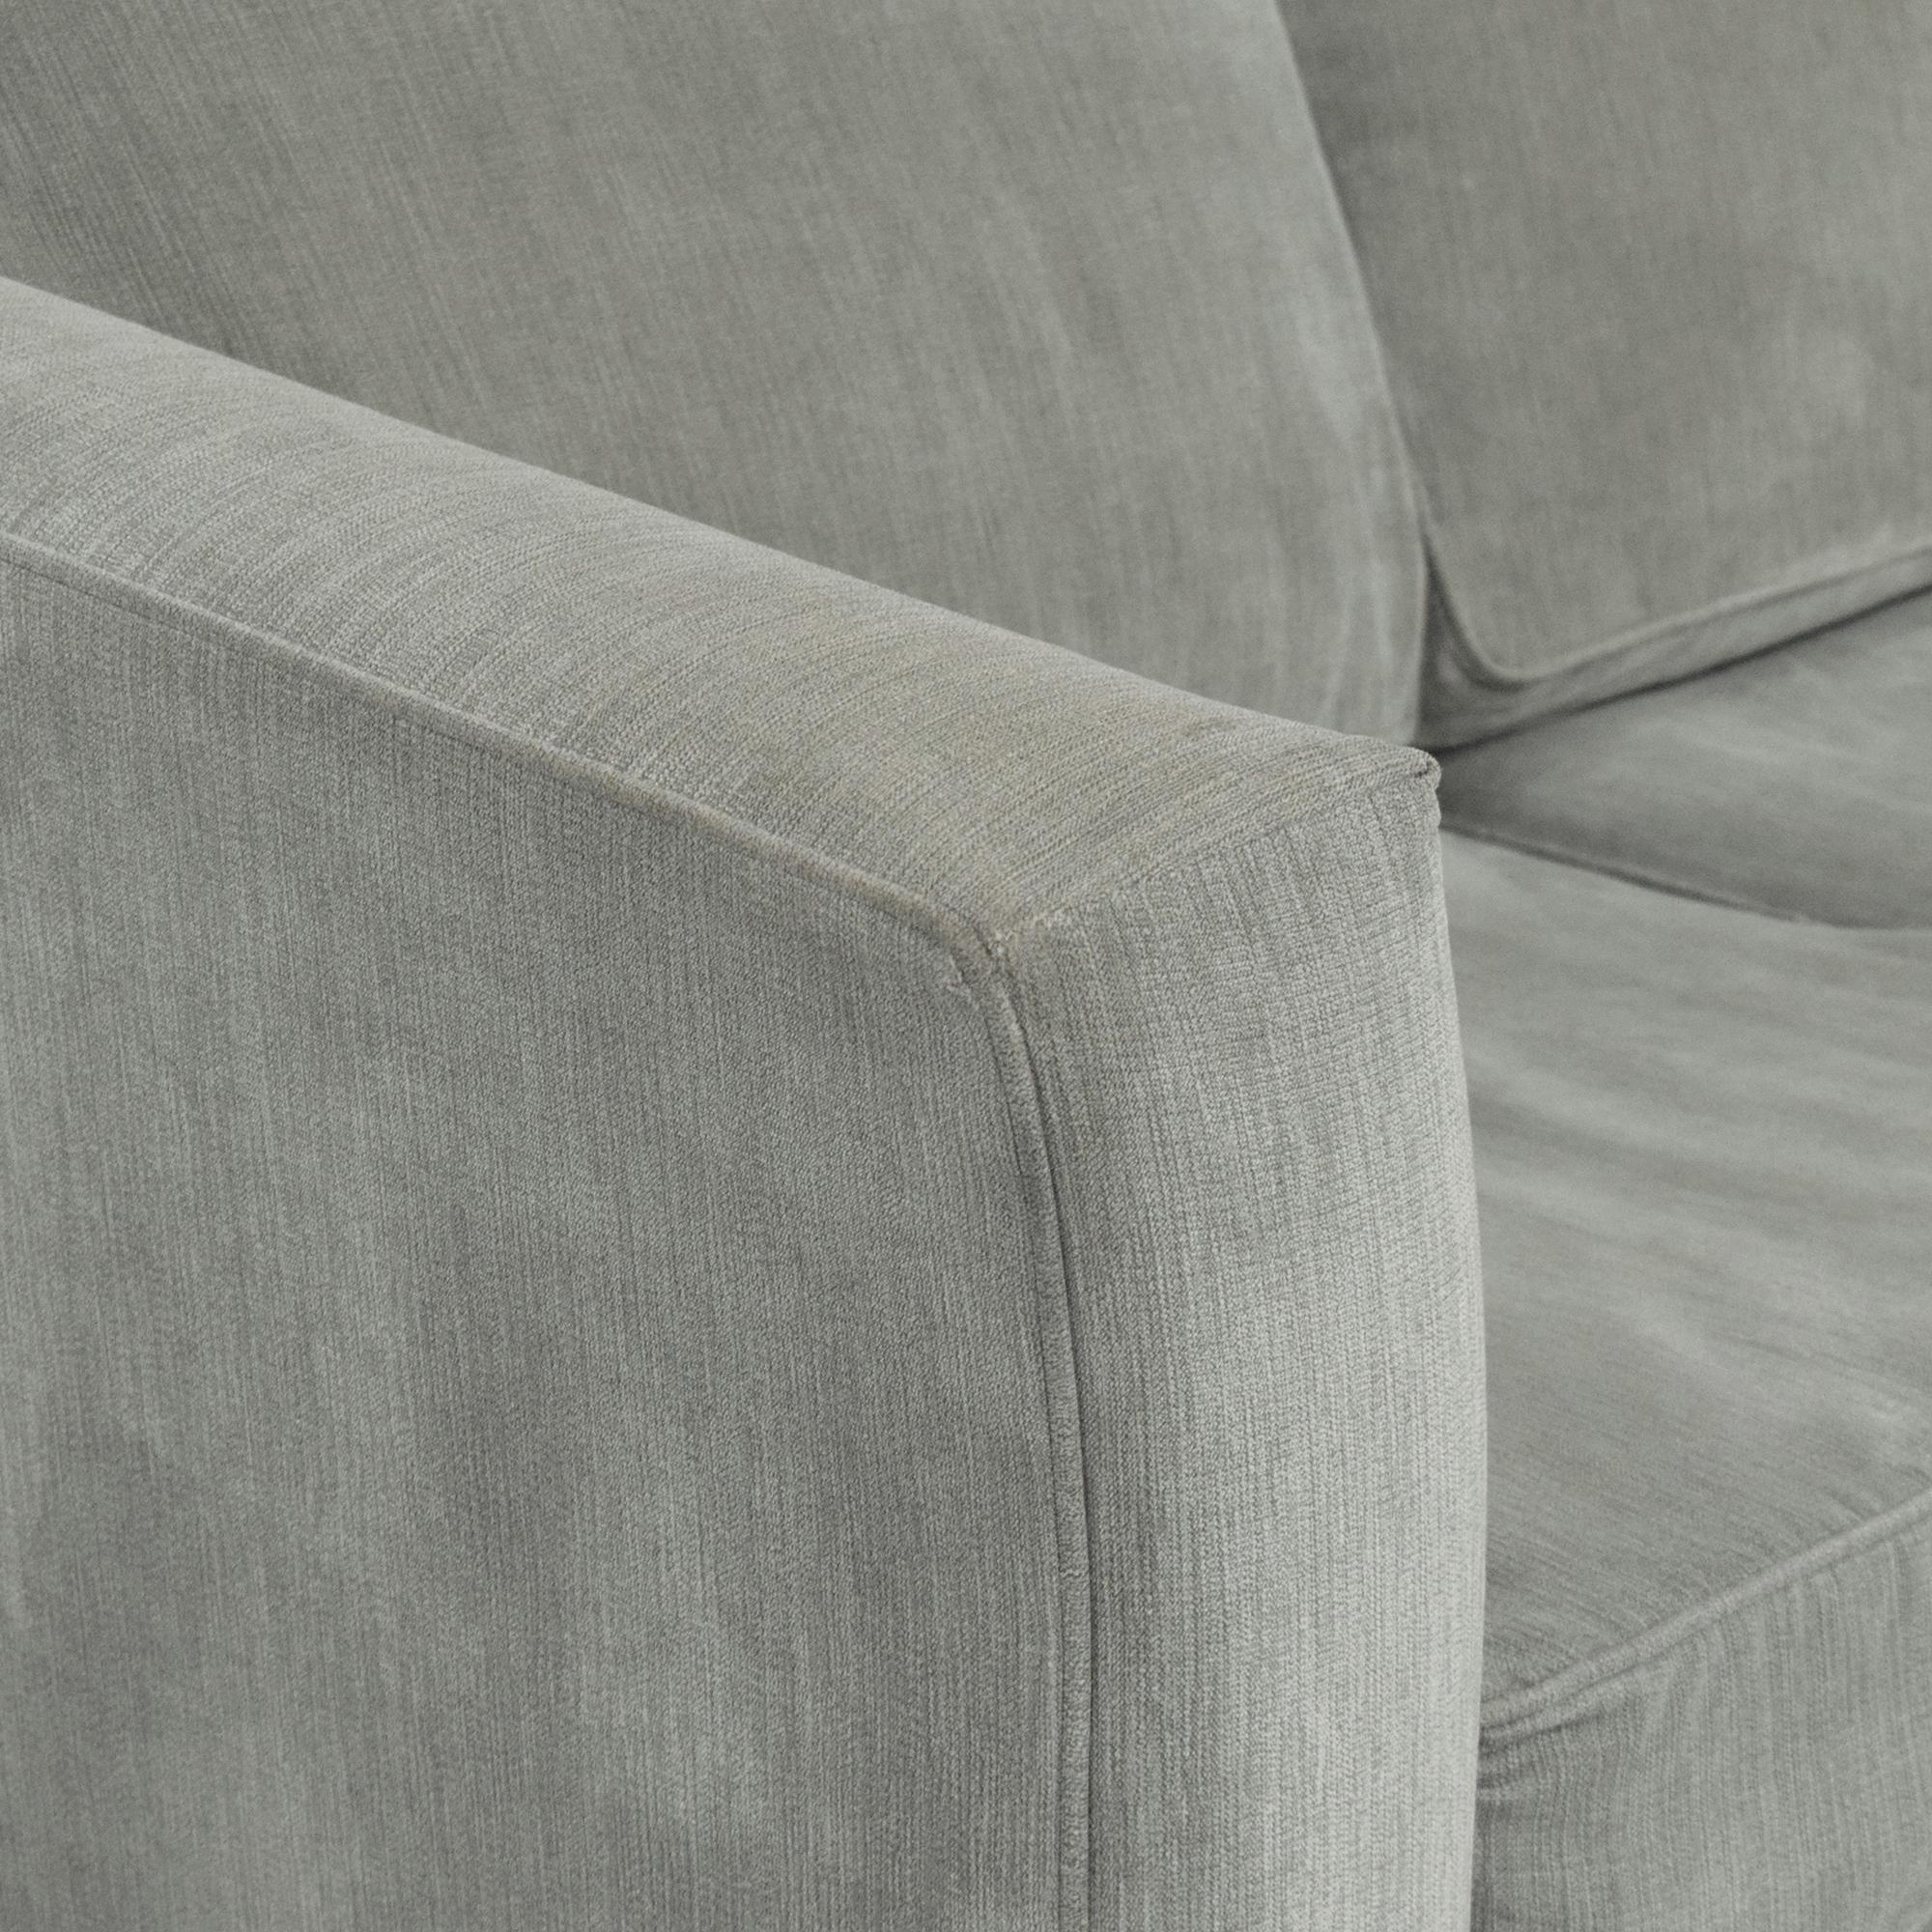 Macy's Macy's Kenton Sleeper Sofa for sale